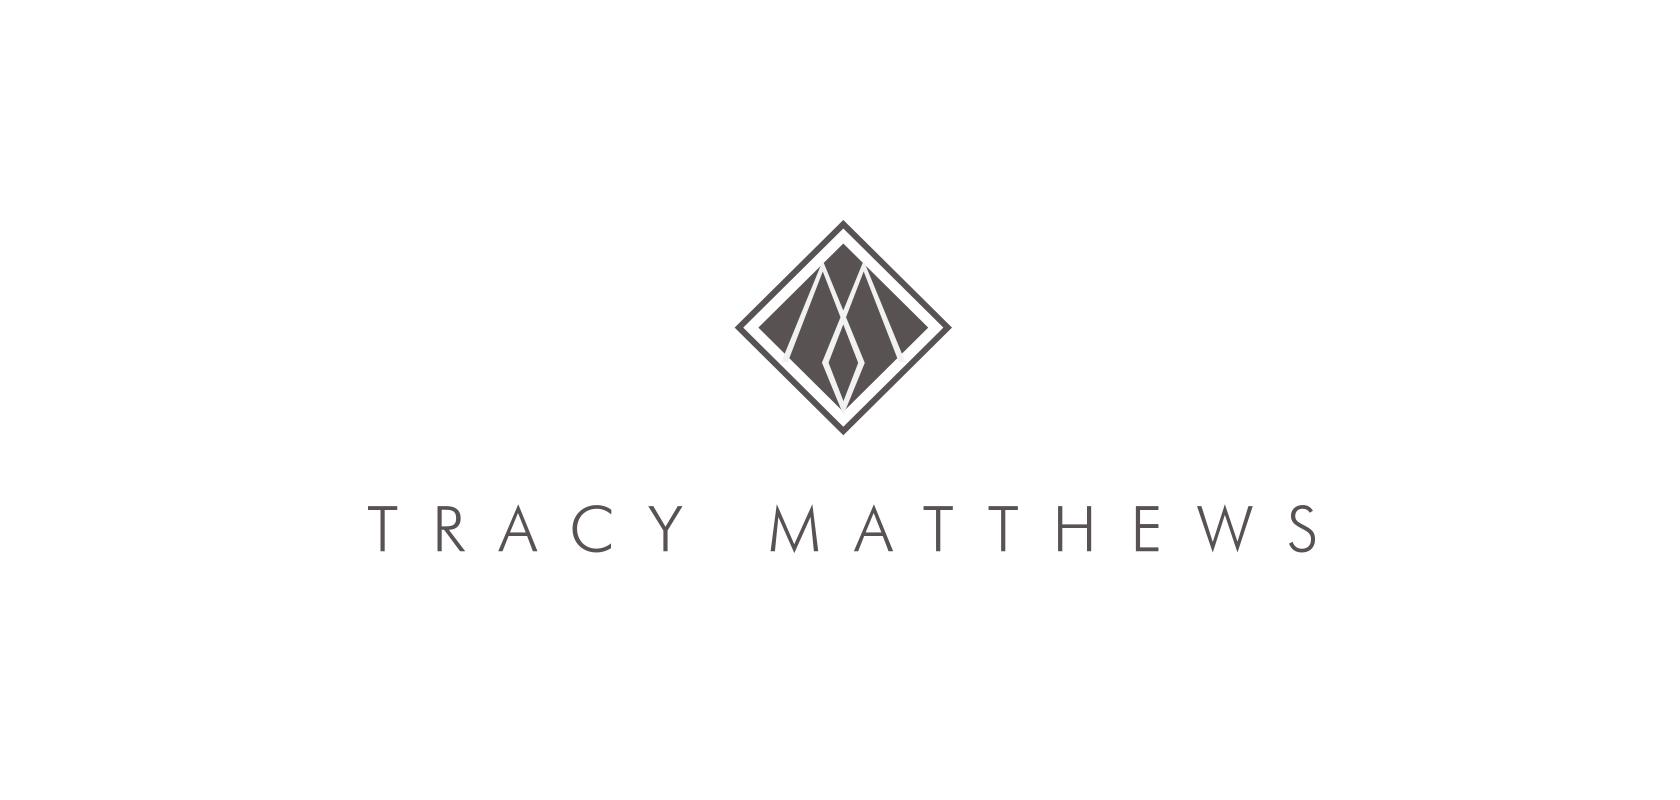 Tracy Mattnews Logo Wallpaper